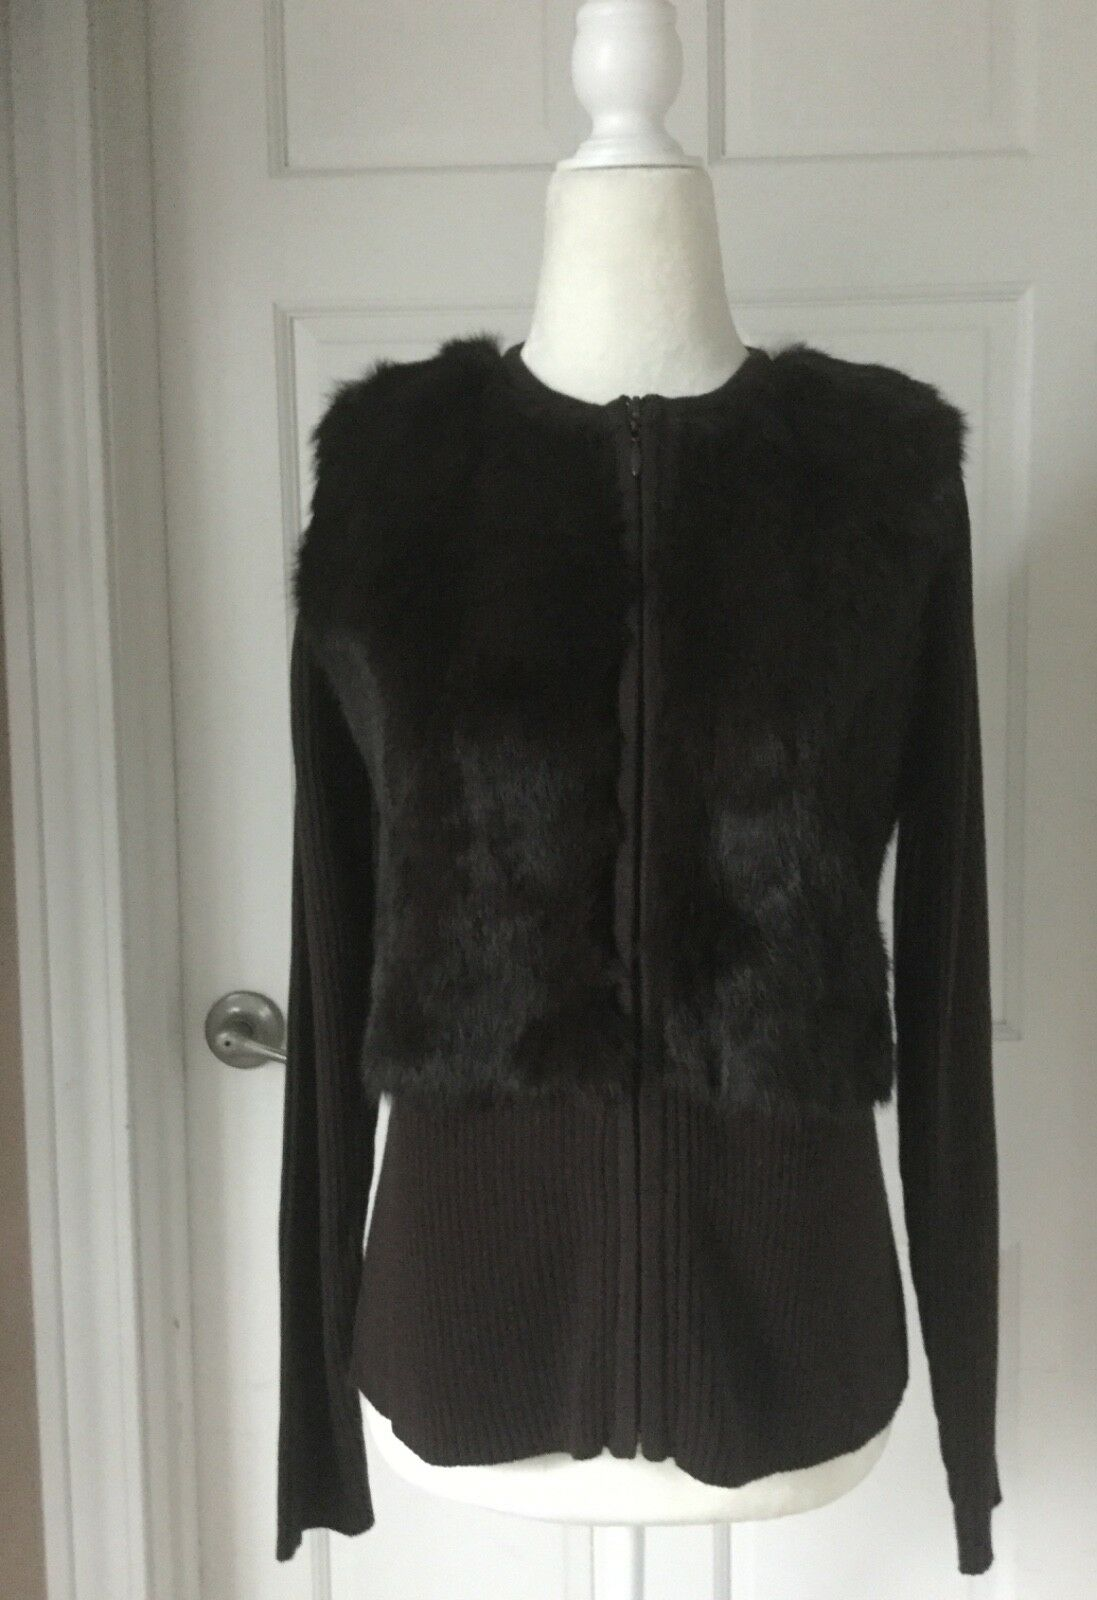 NWOT Beautiful Genuine Rabbit Fur Rib Knit Zipper Zipper Zipper Front Chocolate Brown Sweater 934701